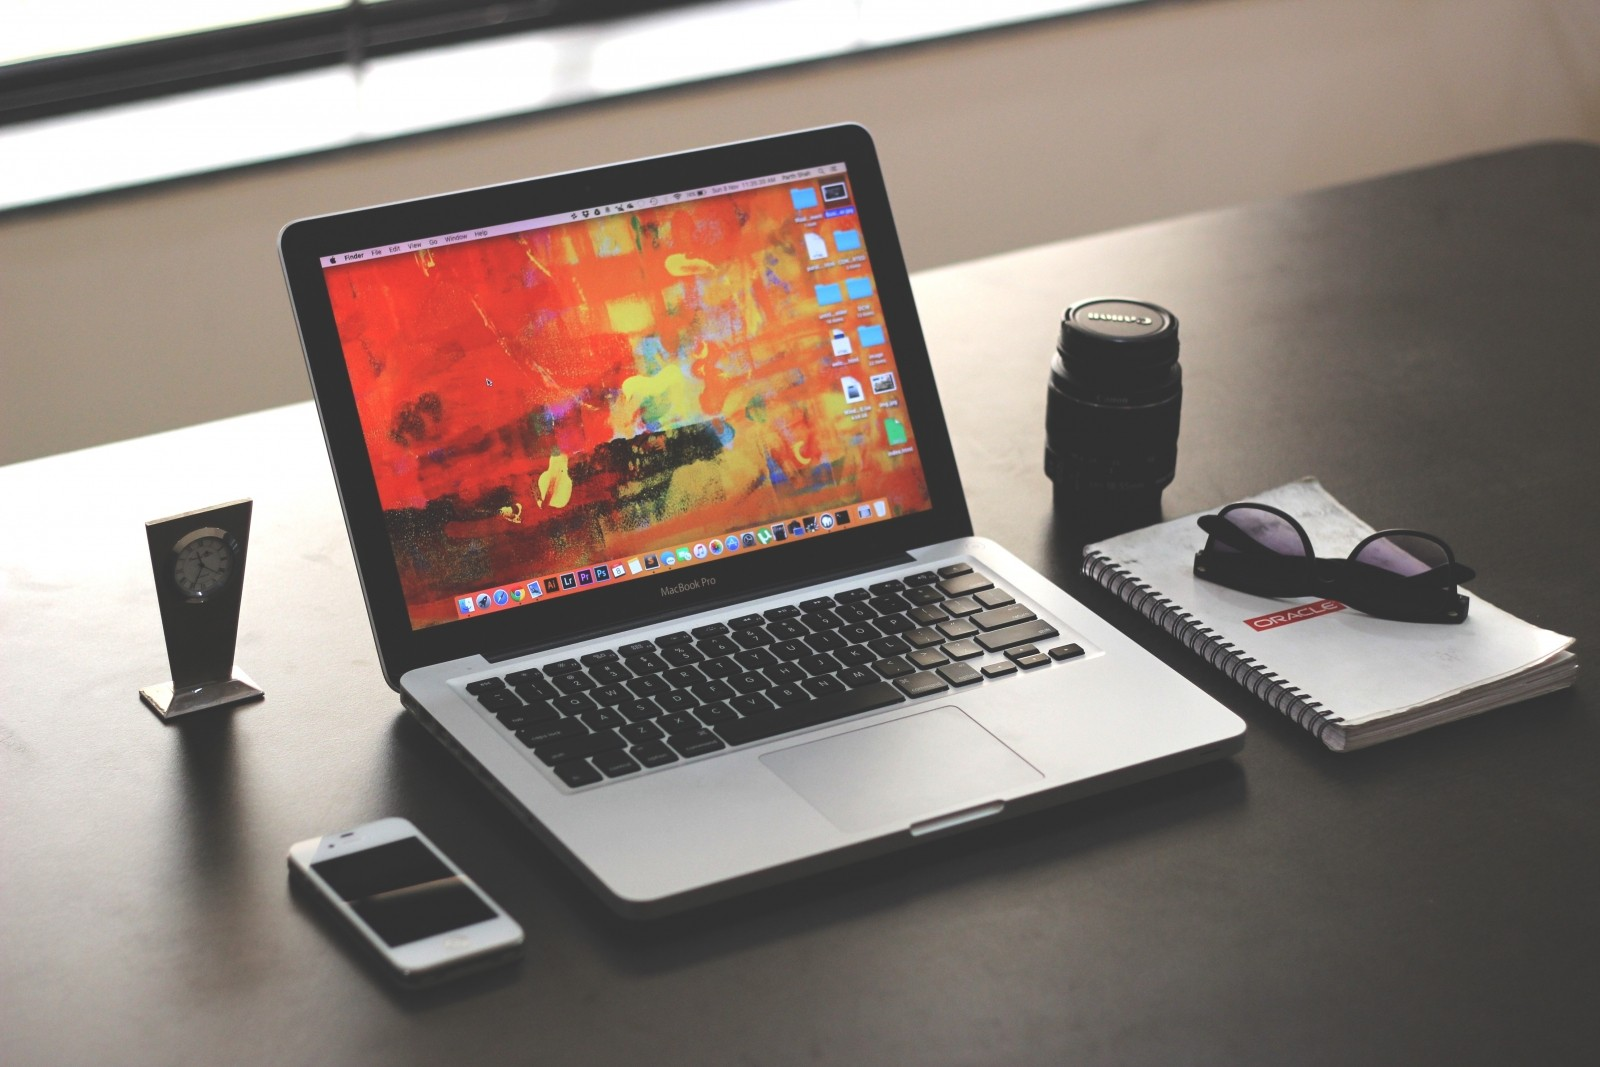 agence web : community management, referencement, inbound marketing